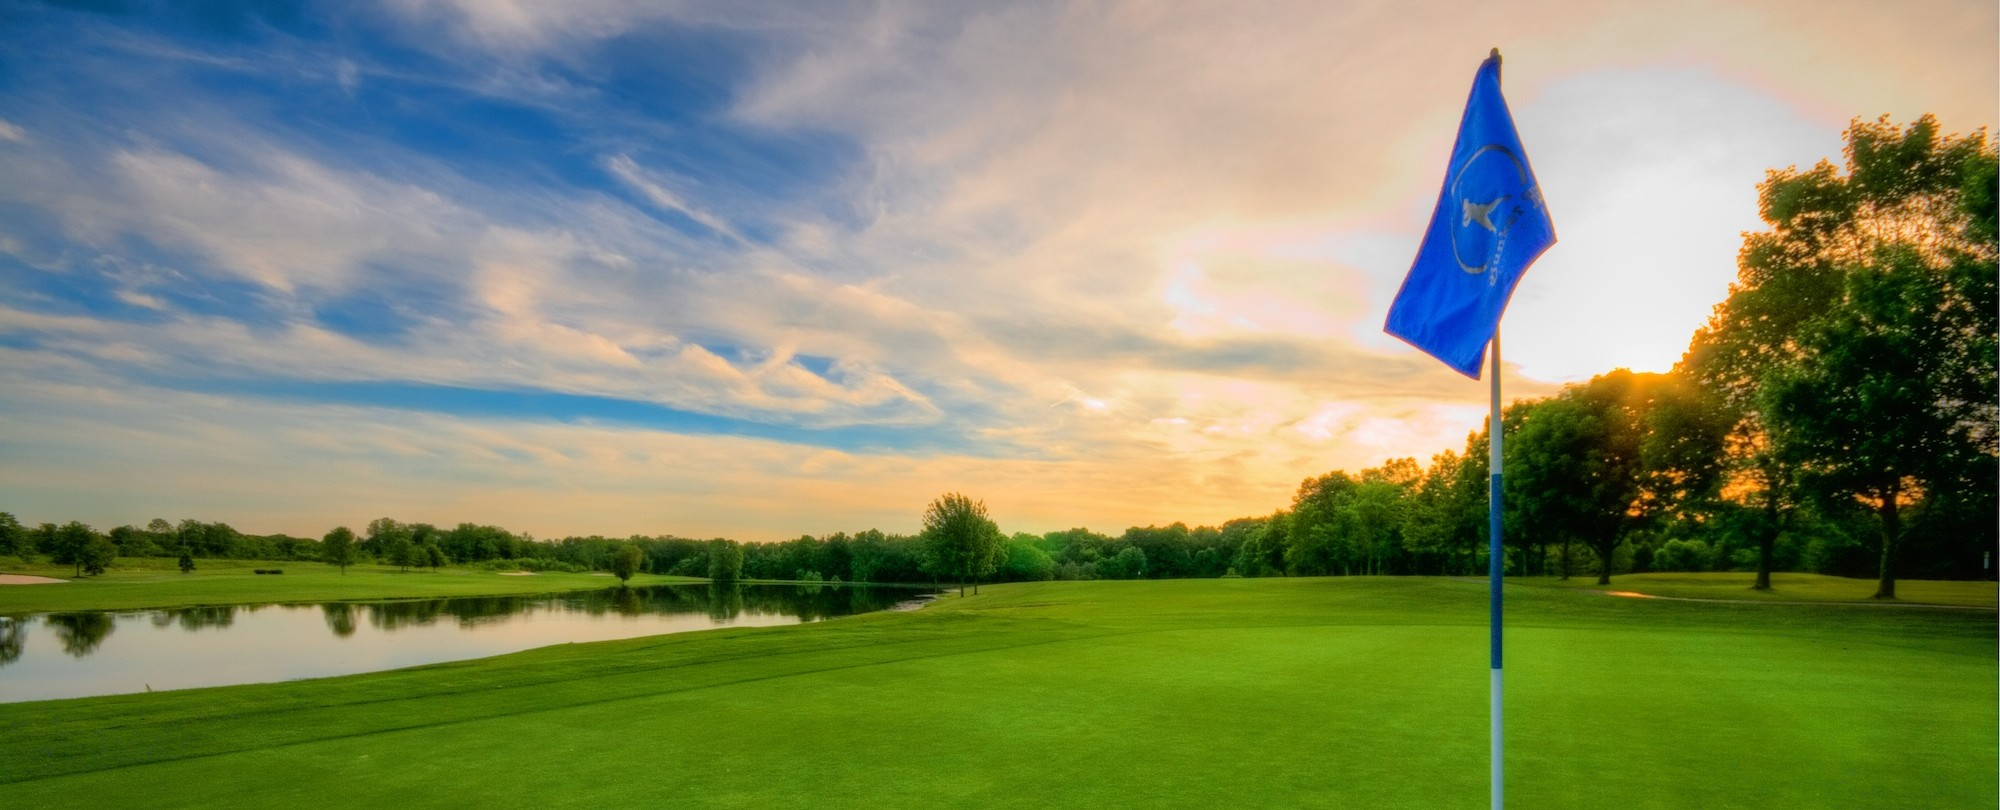 BoGolf golf simulators